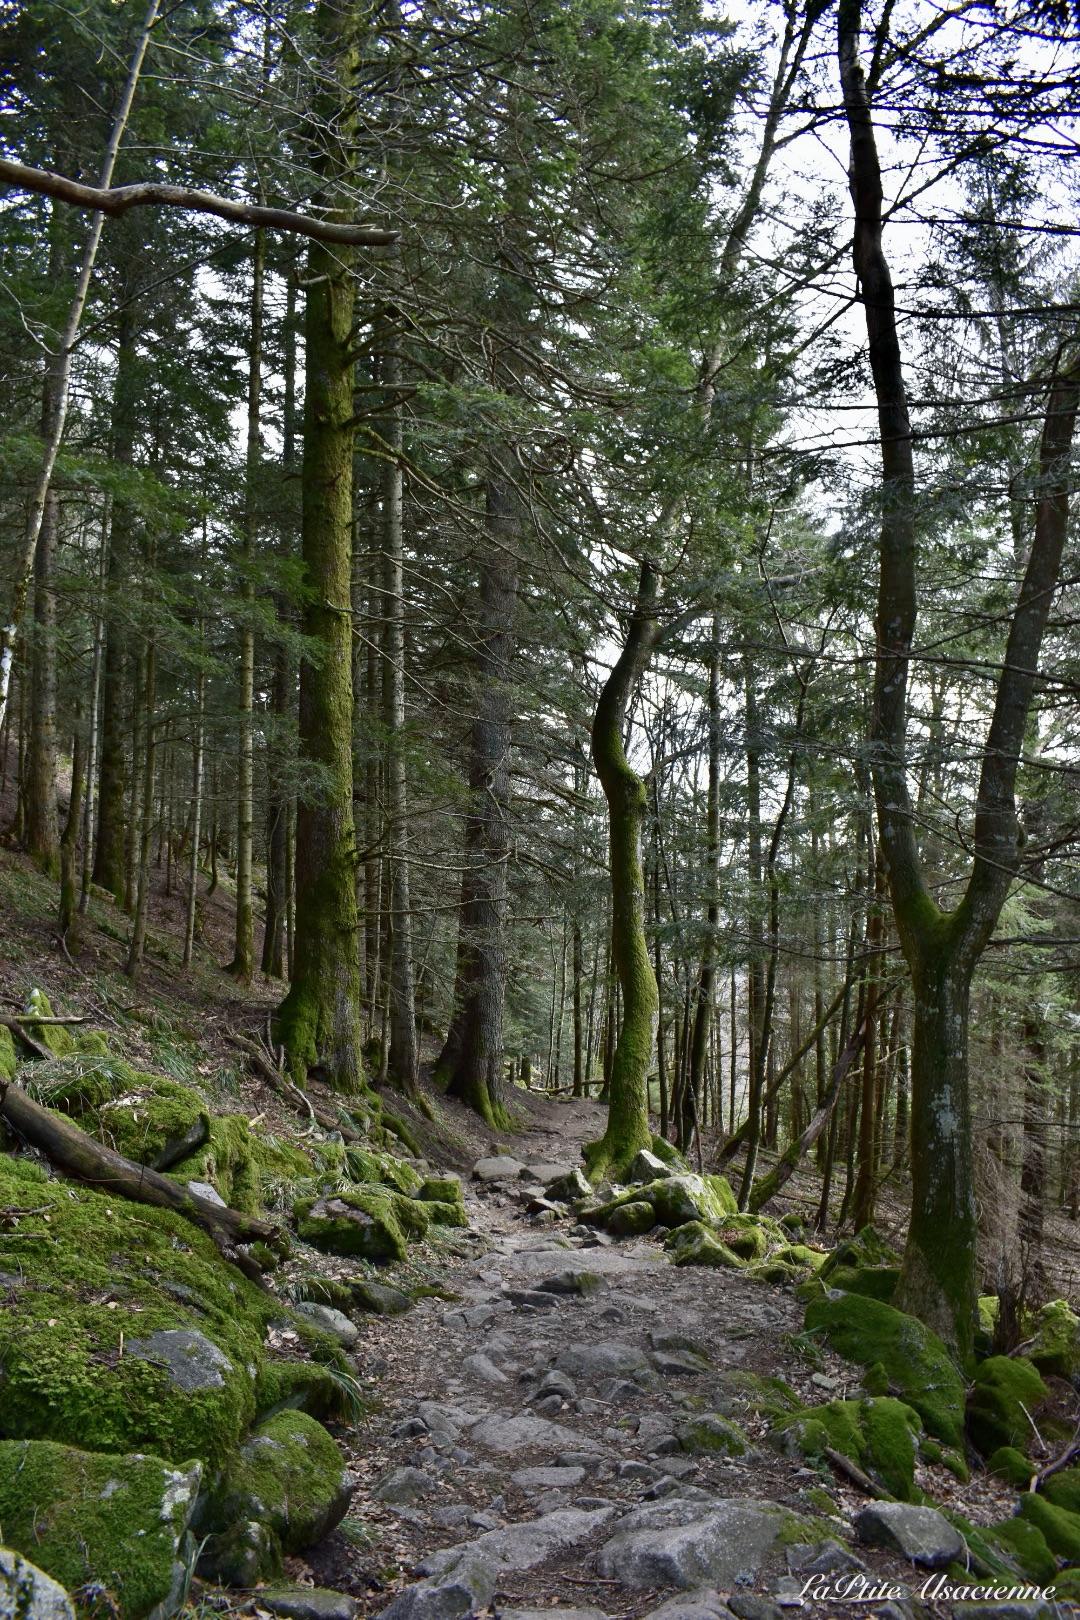 sentier enneigé vers Lieserwasen